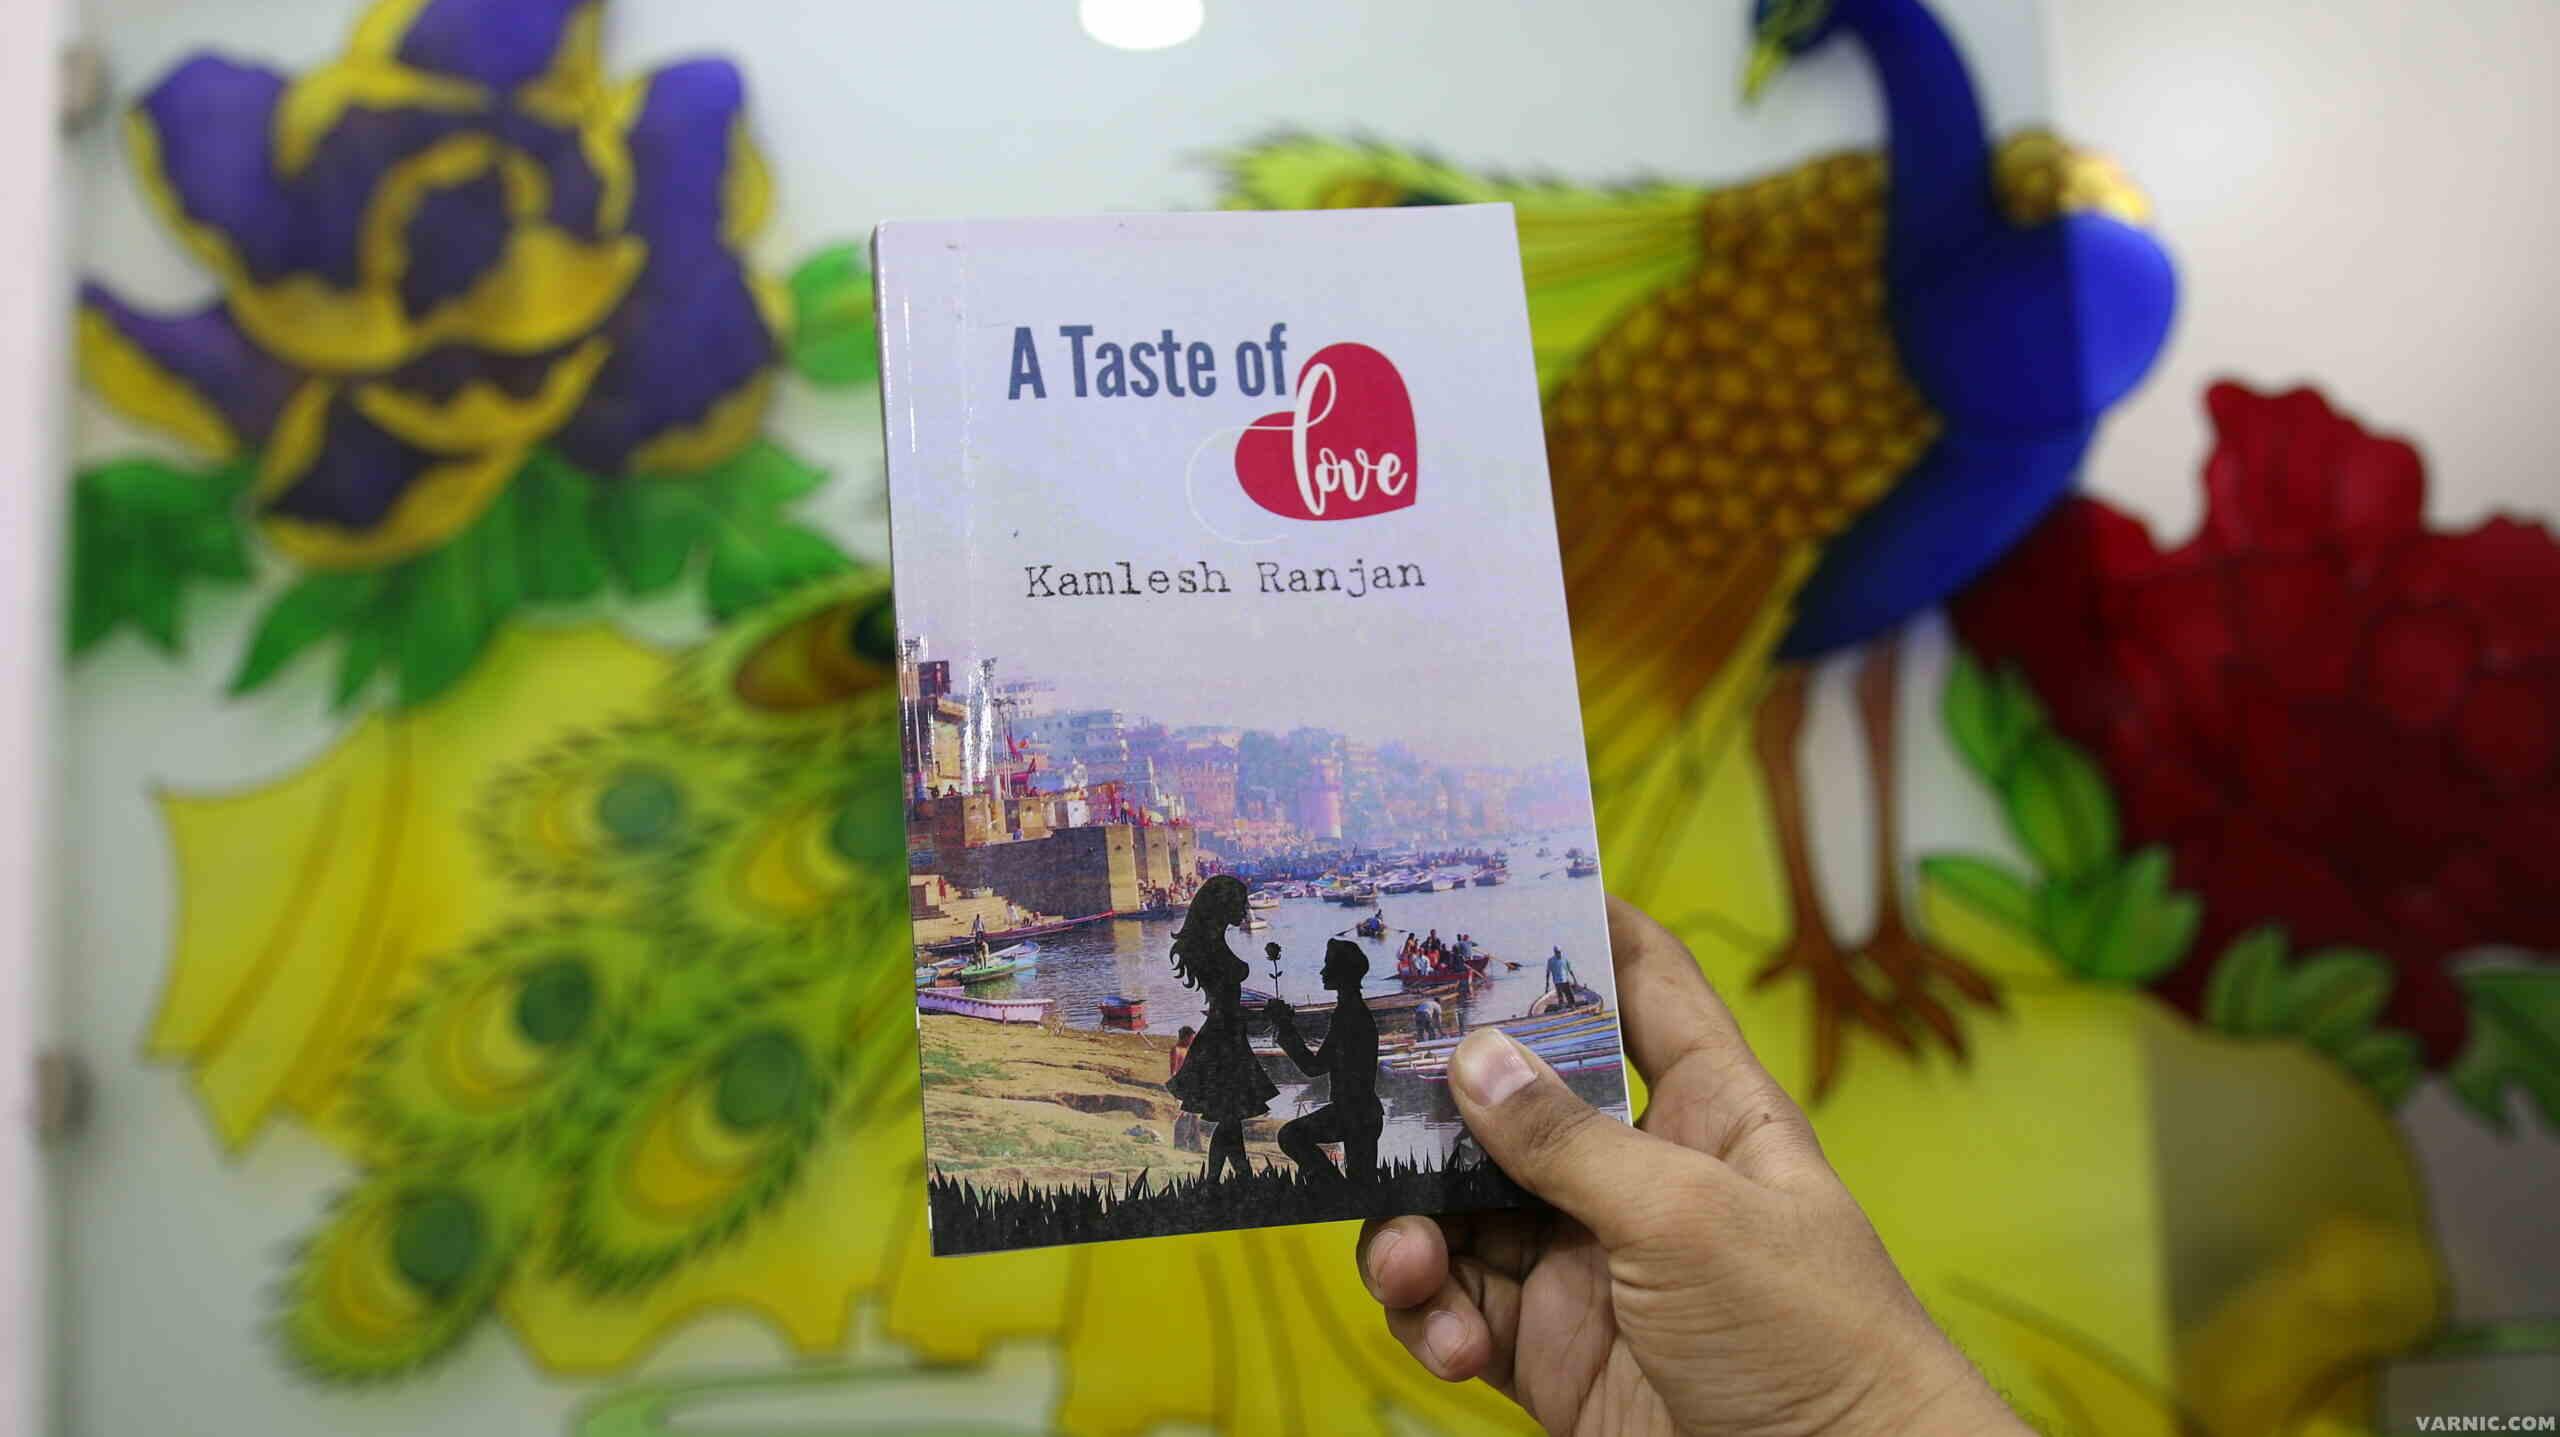 """A Taste of Love by Kamlesh Ranjan"" Novel launched | Varnic"